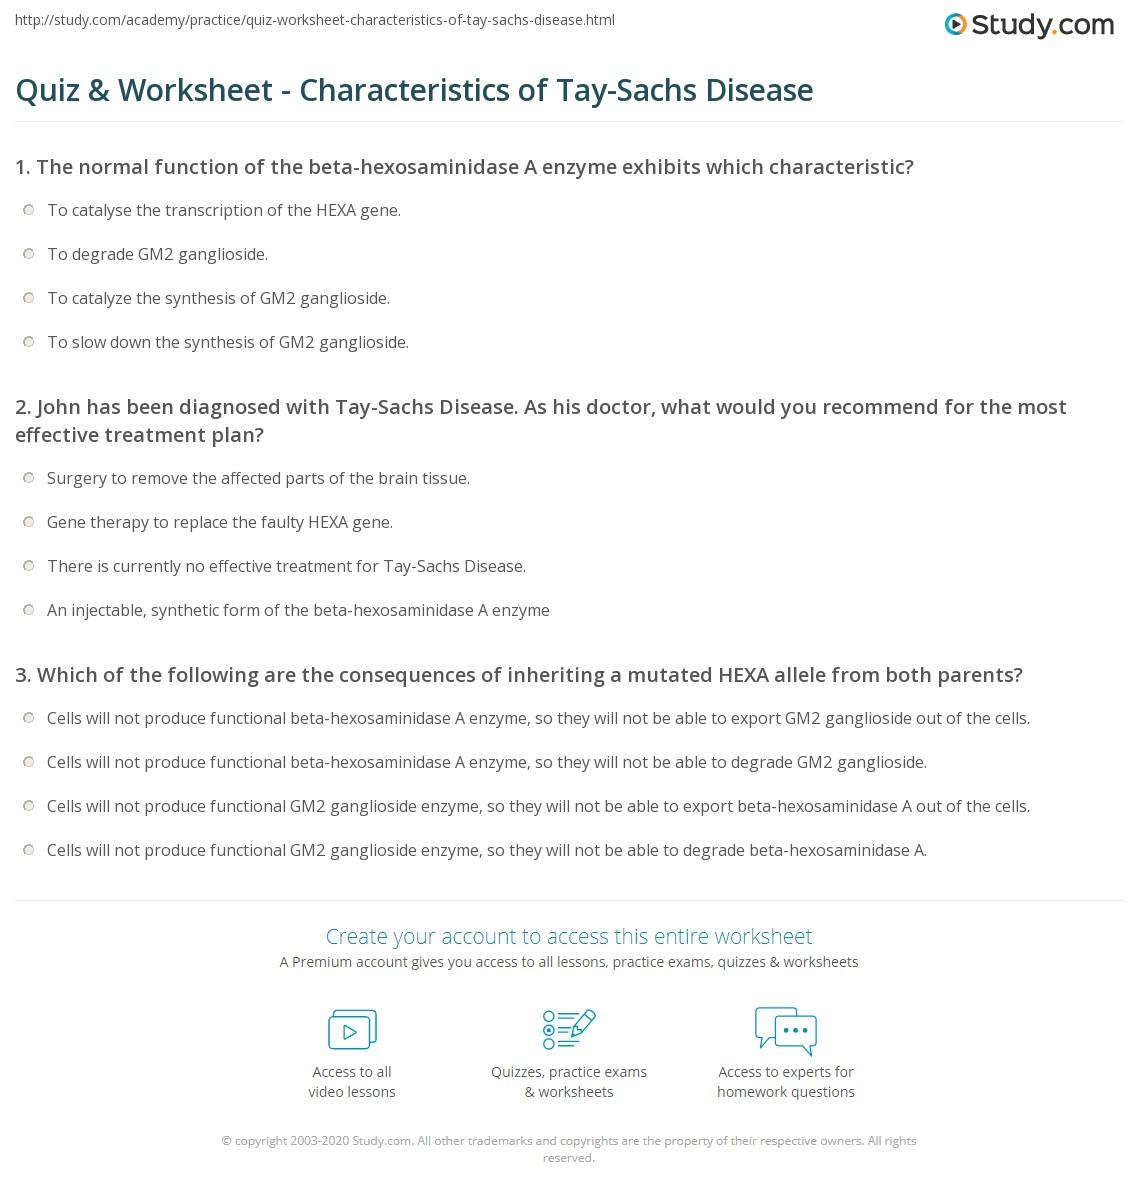 Quiz & Worksheet - Characteristics of Tay-Sachs Disease   Study.com